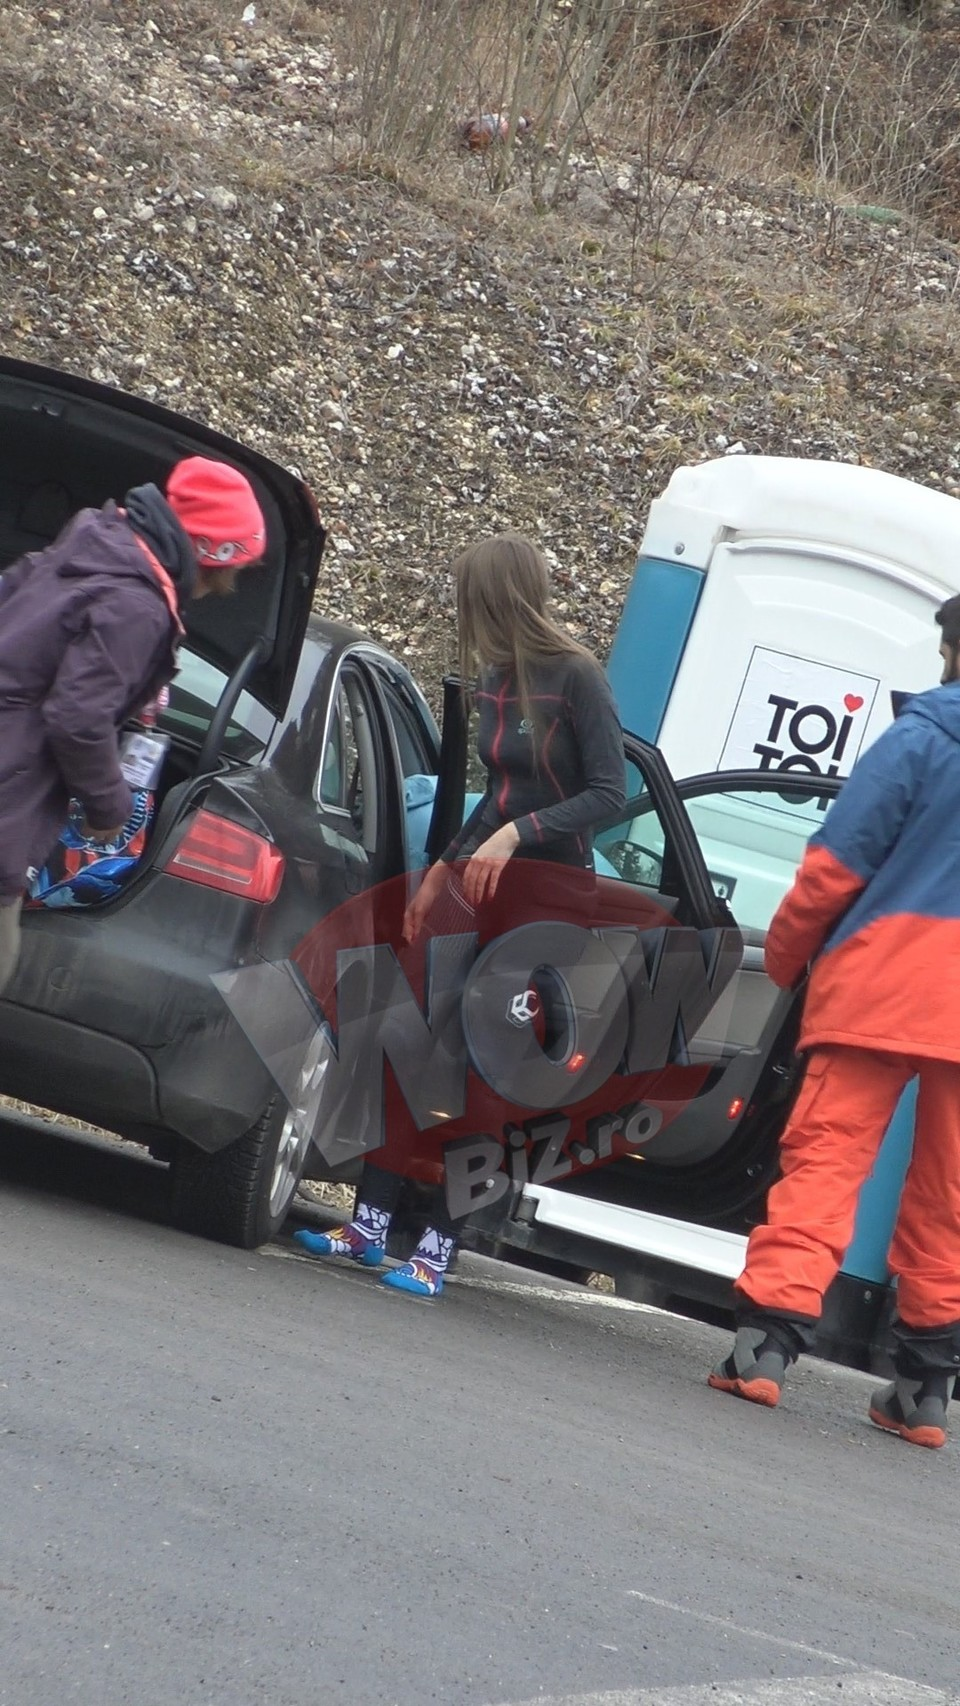 Video exclusiv! Iulia Albu s-a schimbat in masina! Fashion editorul a facut parada modei, la munte, cu iubitul